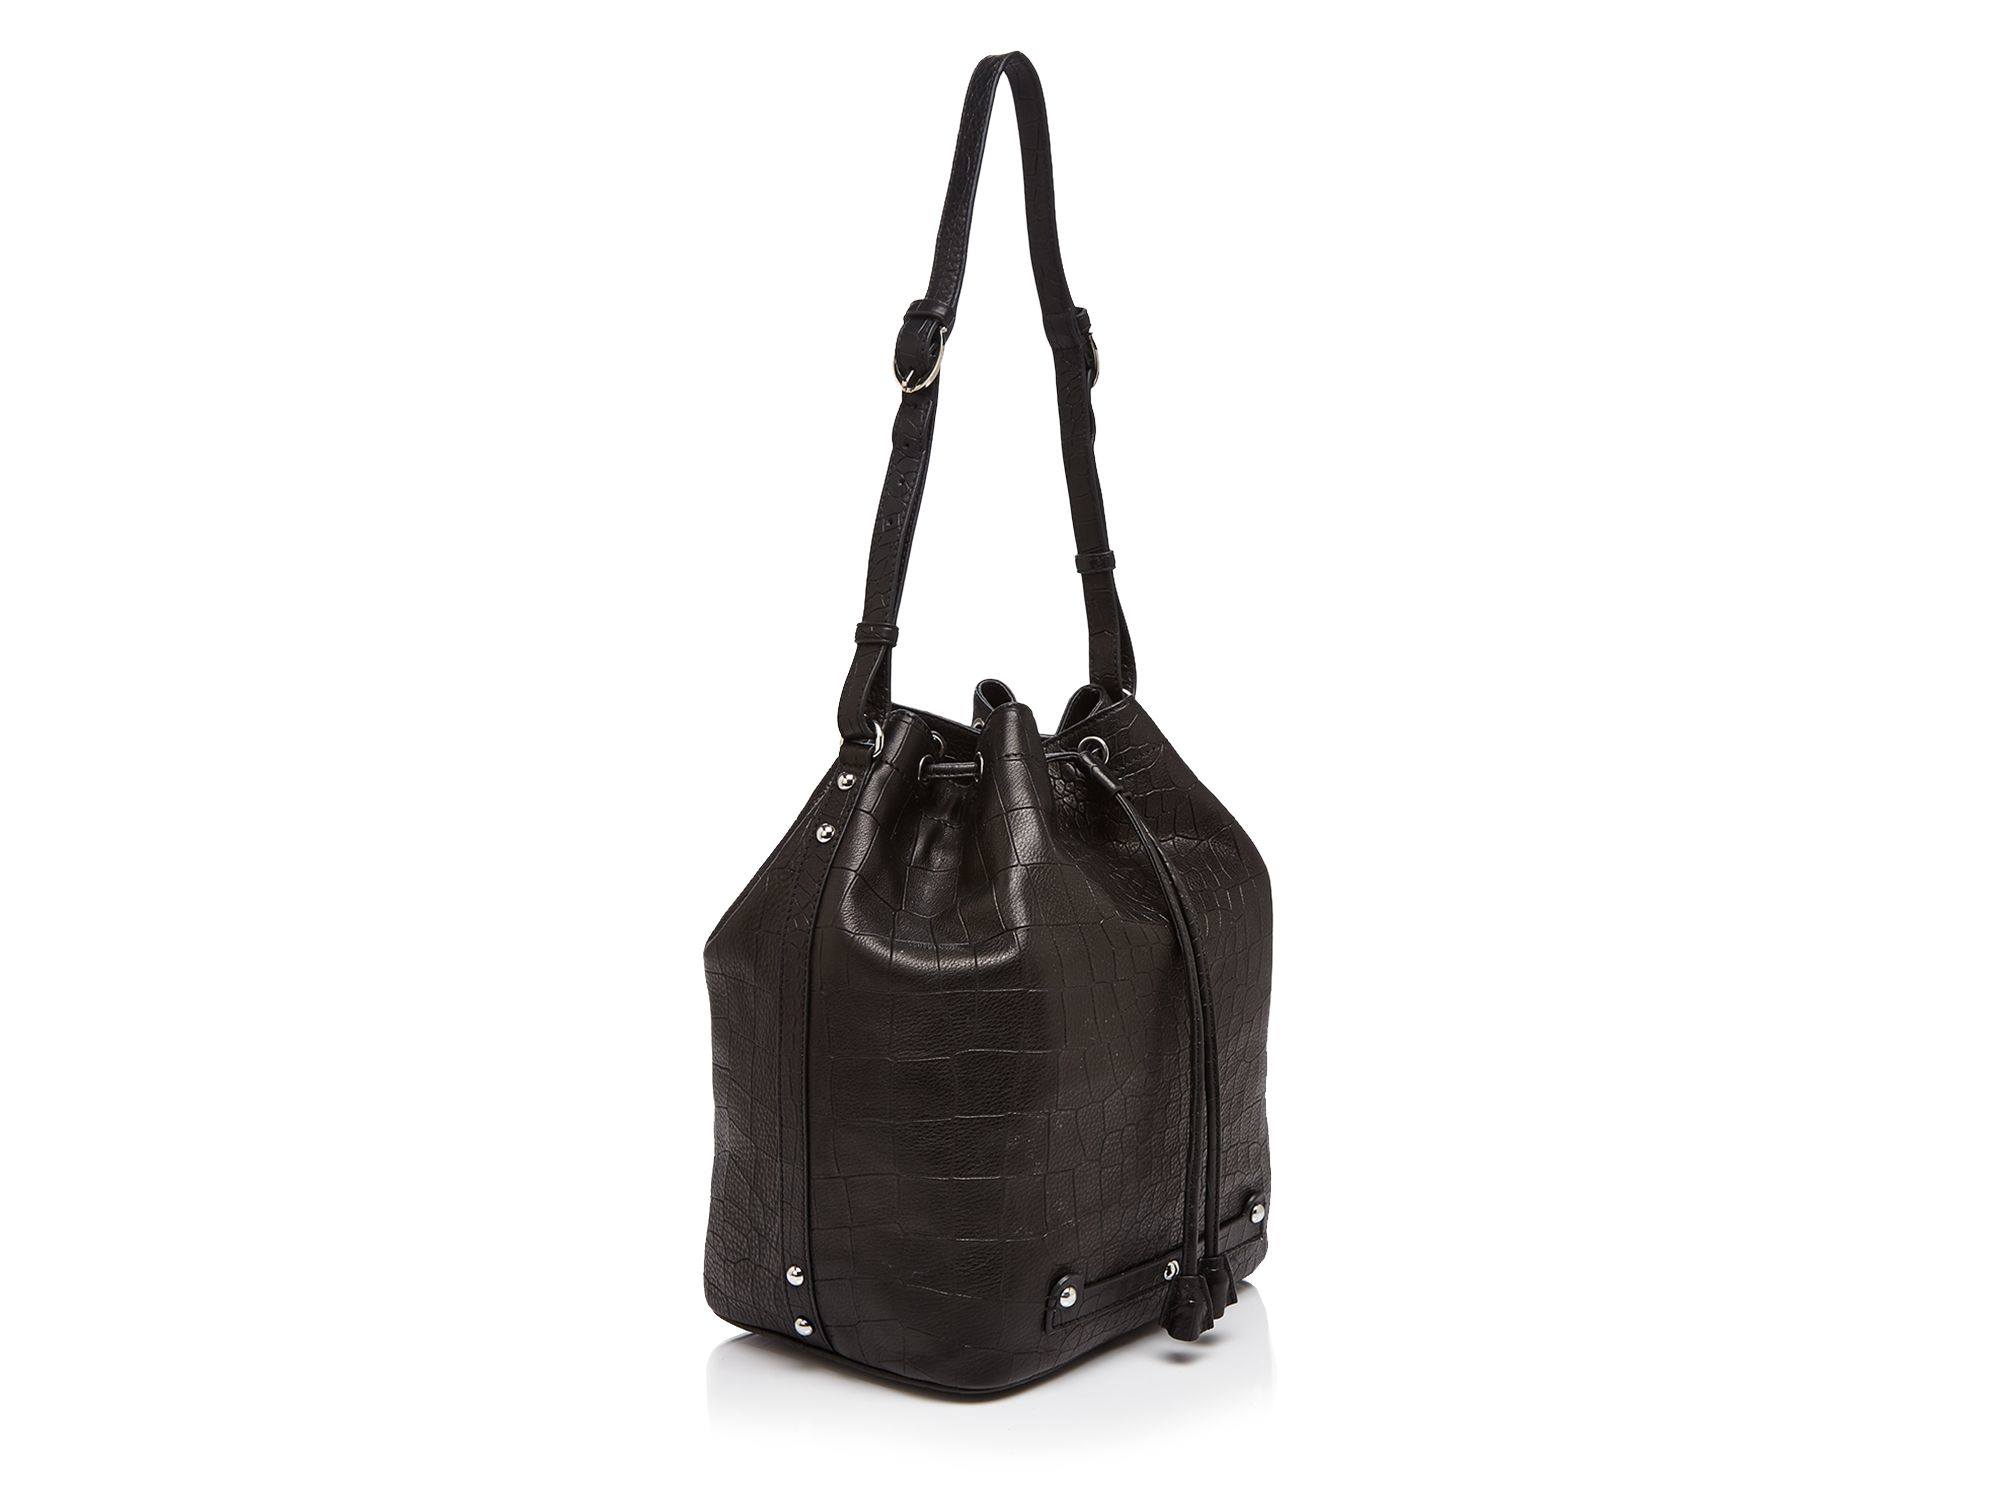 Lyst - Etienne Aigner Large Etienne Croc-embossed Bucket Bag in Black 122867a32d